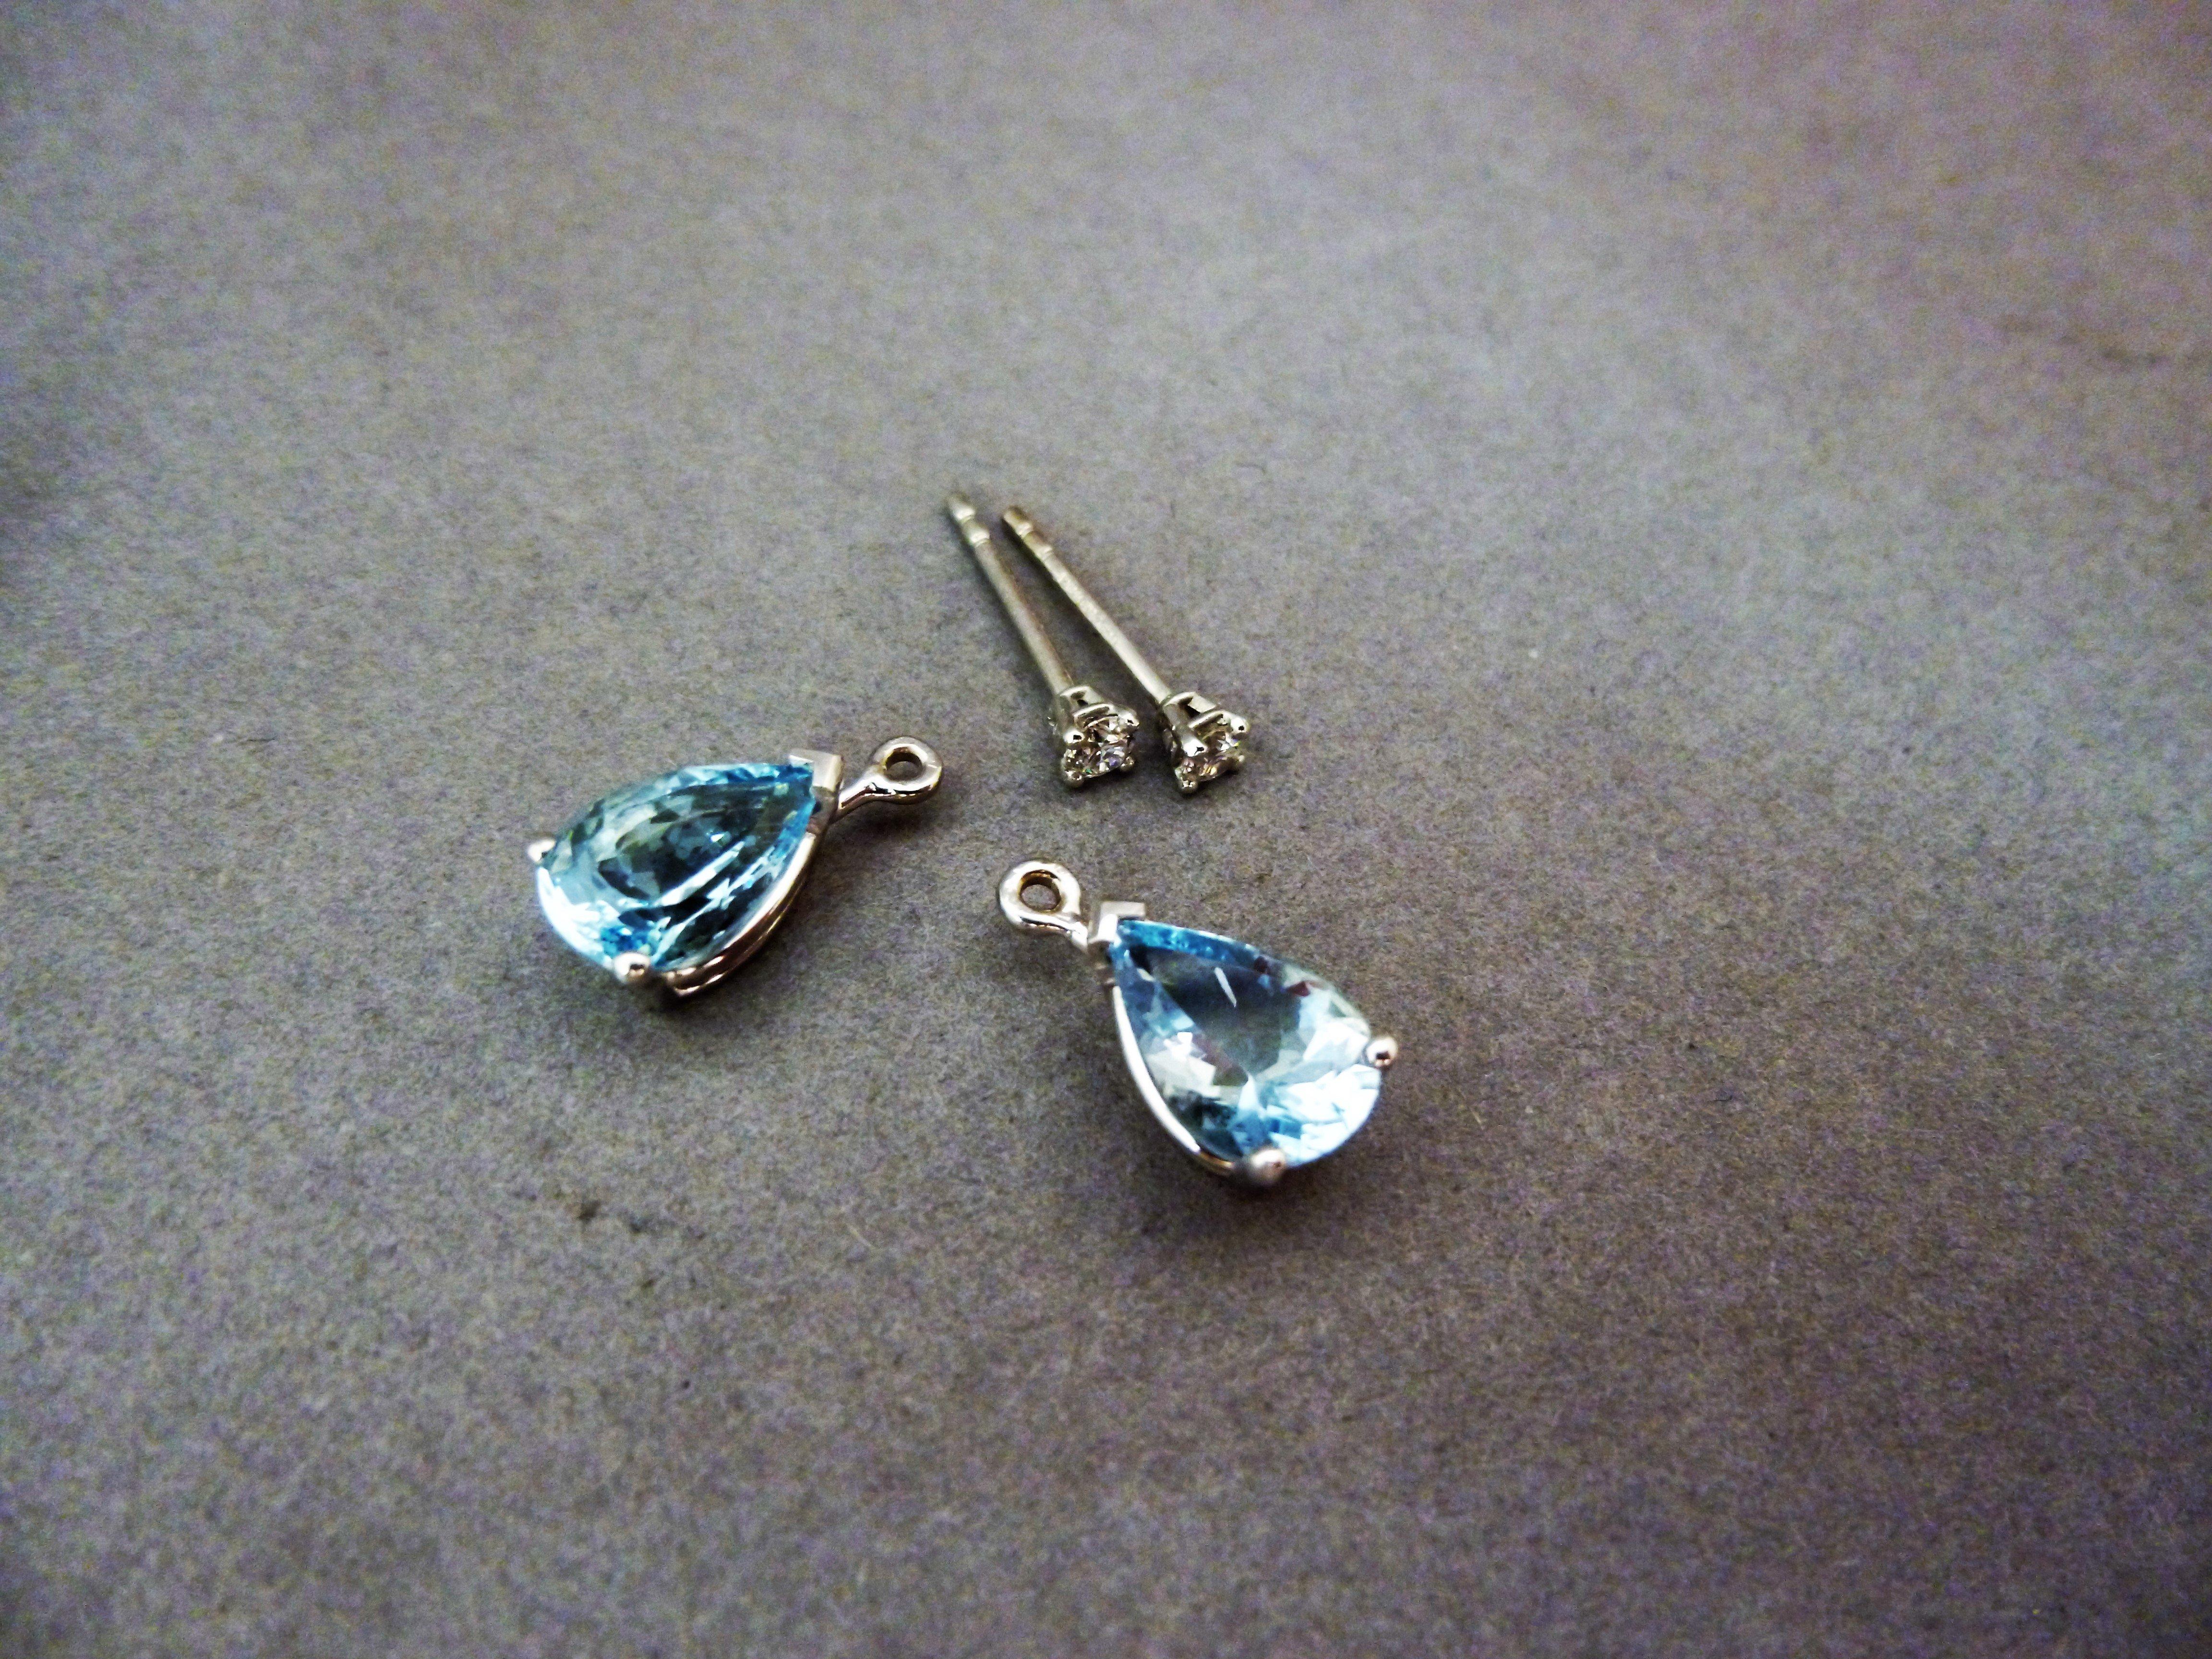 Aqua marine and diamond interchangeable earrings